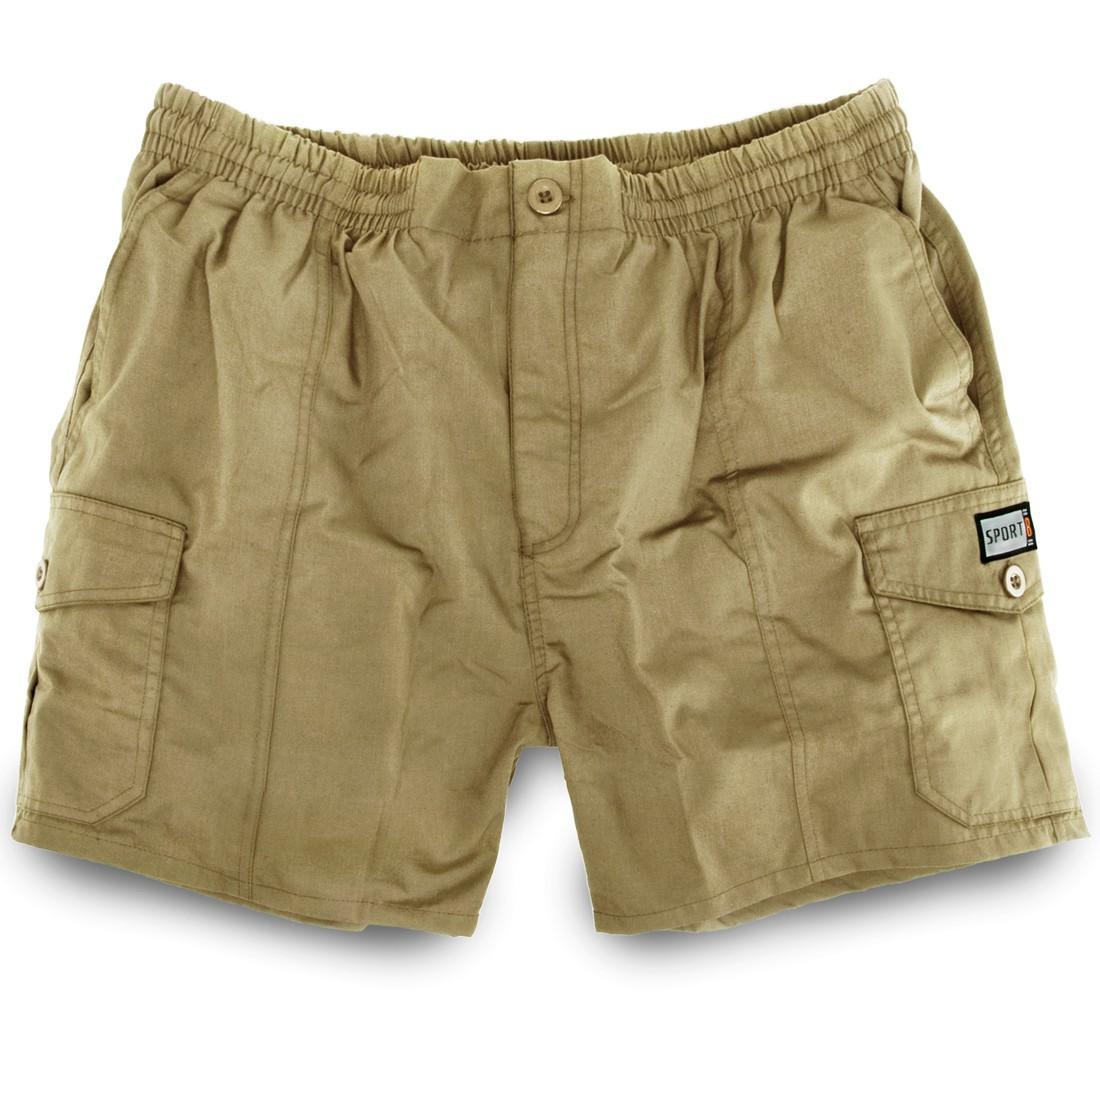 leichte shorts sommer shorts cargo shorts kurze hose. Black Bedroom Furniture Sets. Home Design Ideas